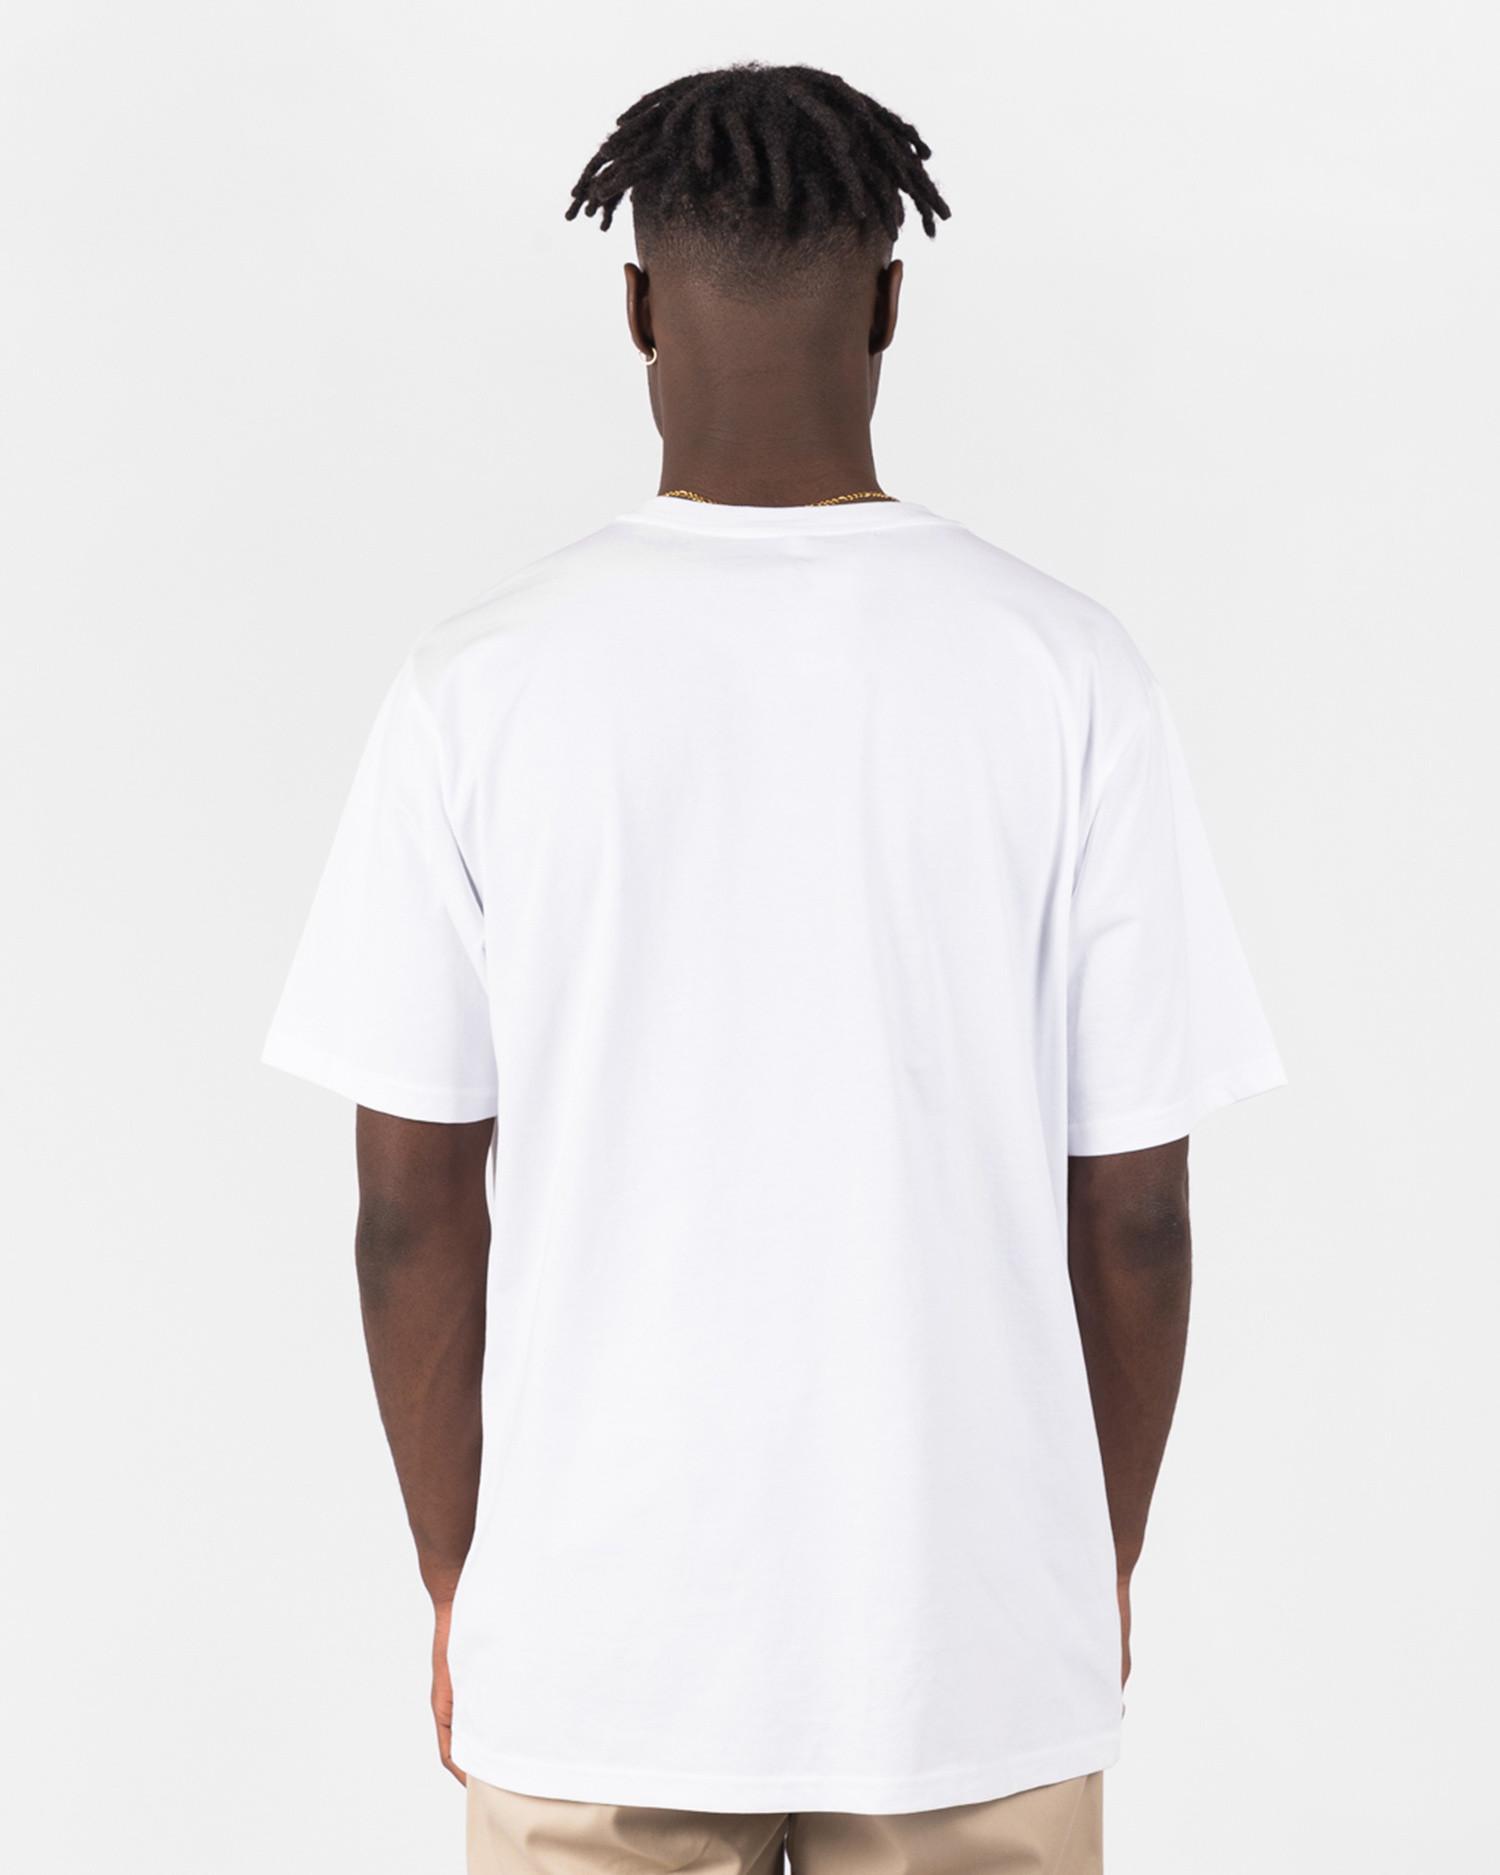 Lockwood Embroidery T-shirt White